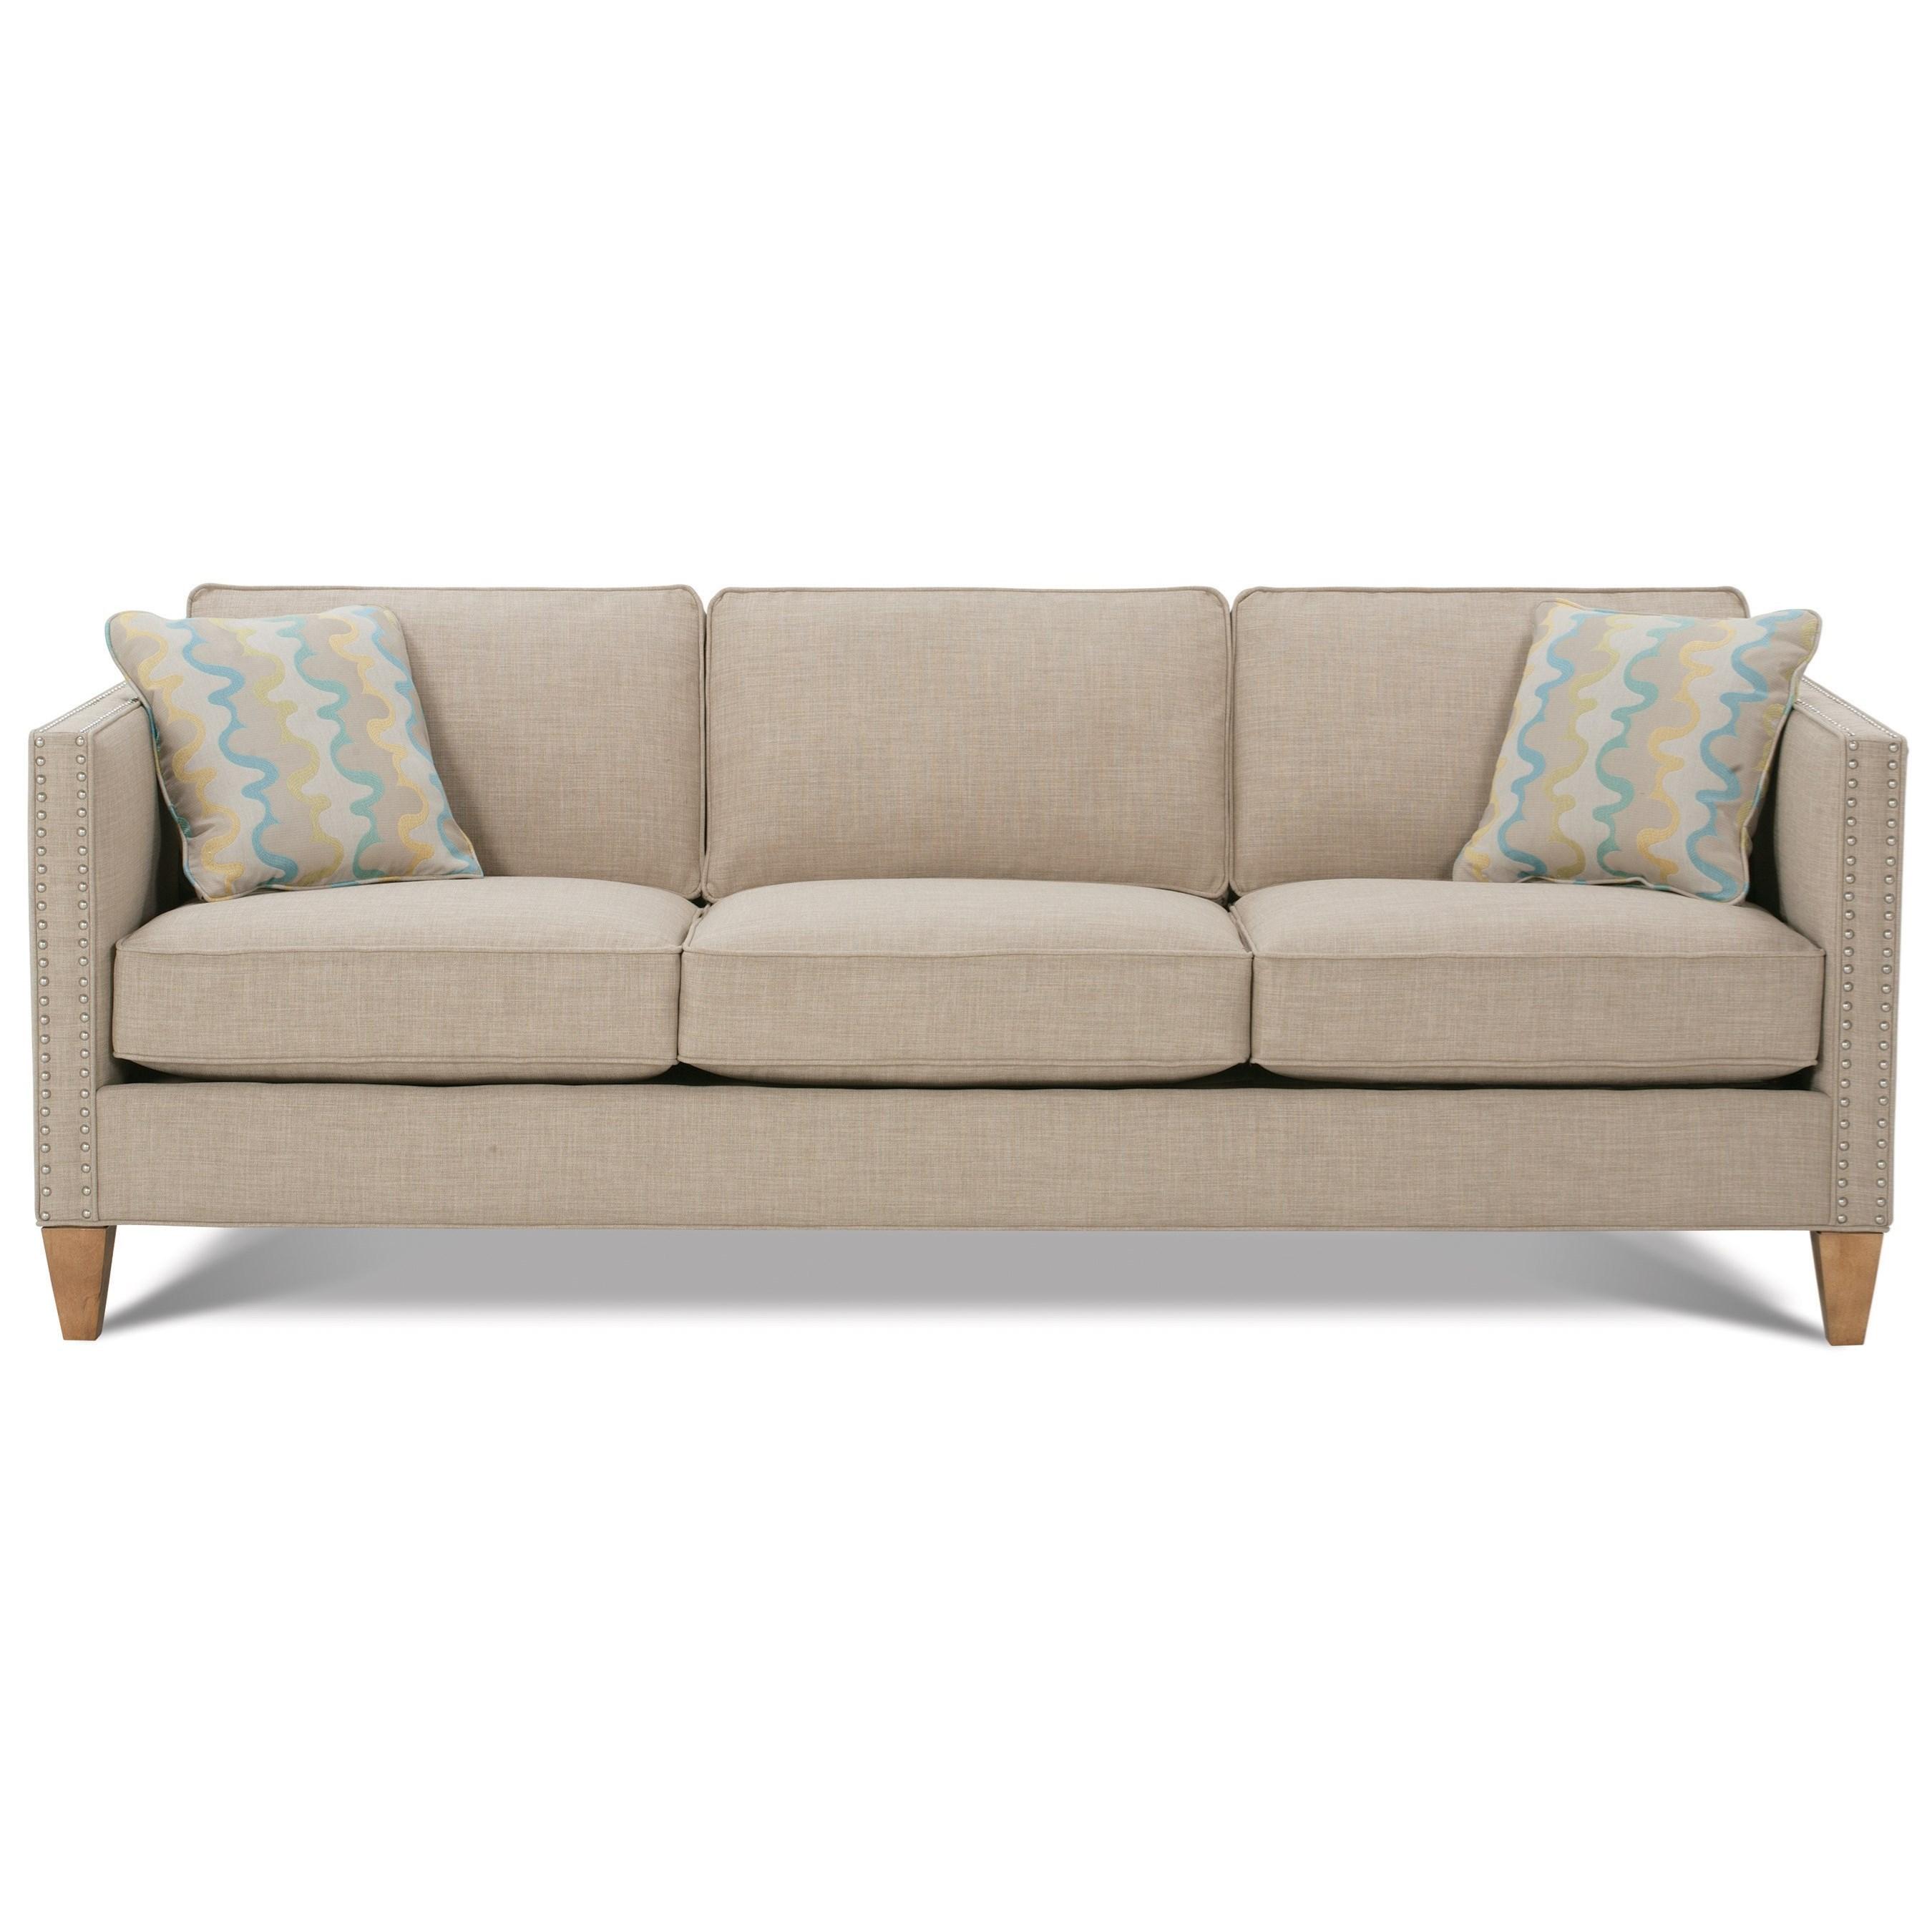 Mitchell - RXO <b>Custom</b> Sofa by Rowe at Baer's Furniture